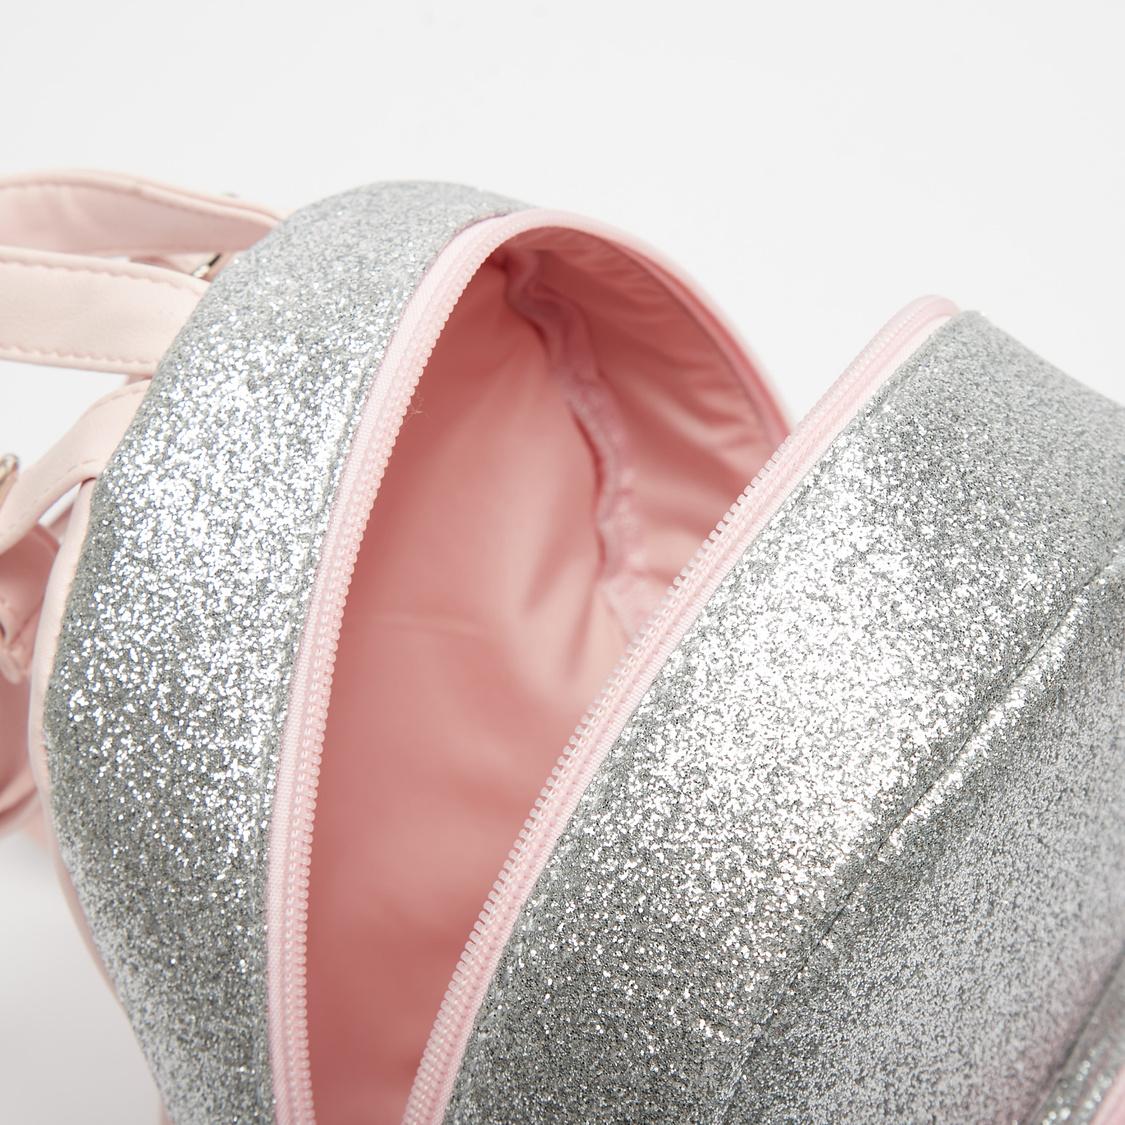 Glitter Backpack with Adjutable Shoulder Straps and Zipper Closure